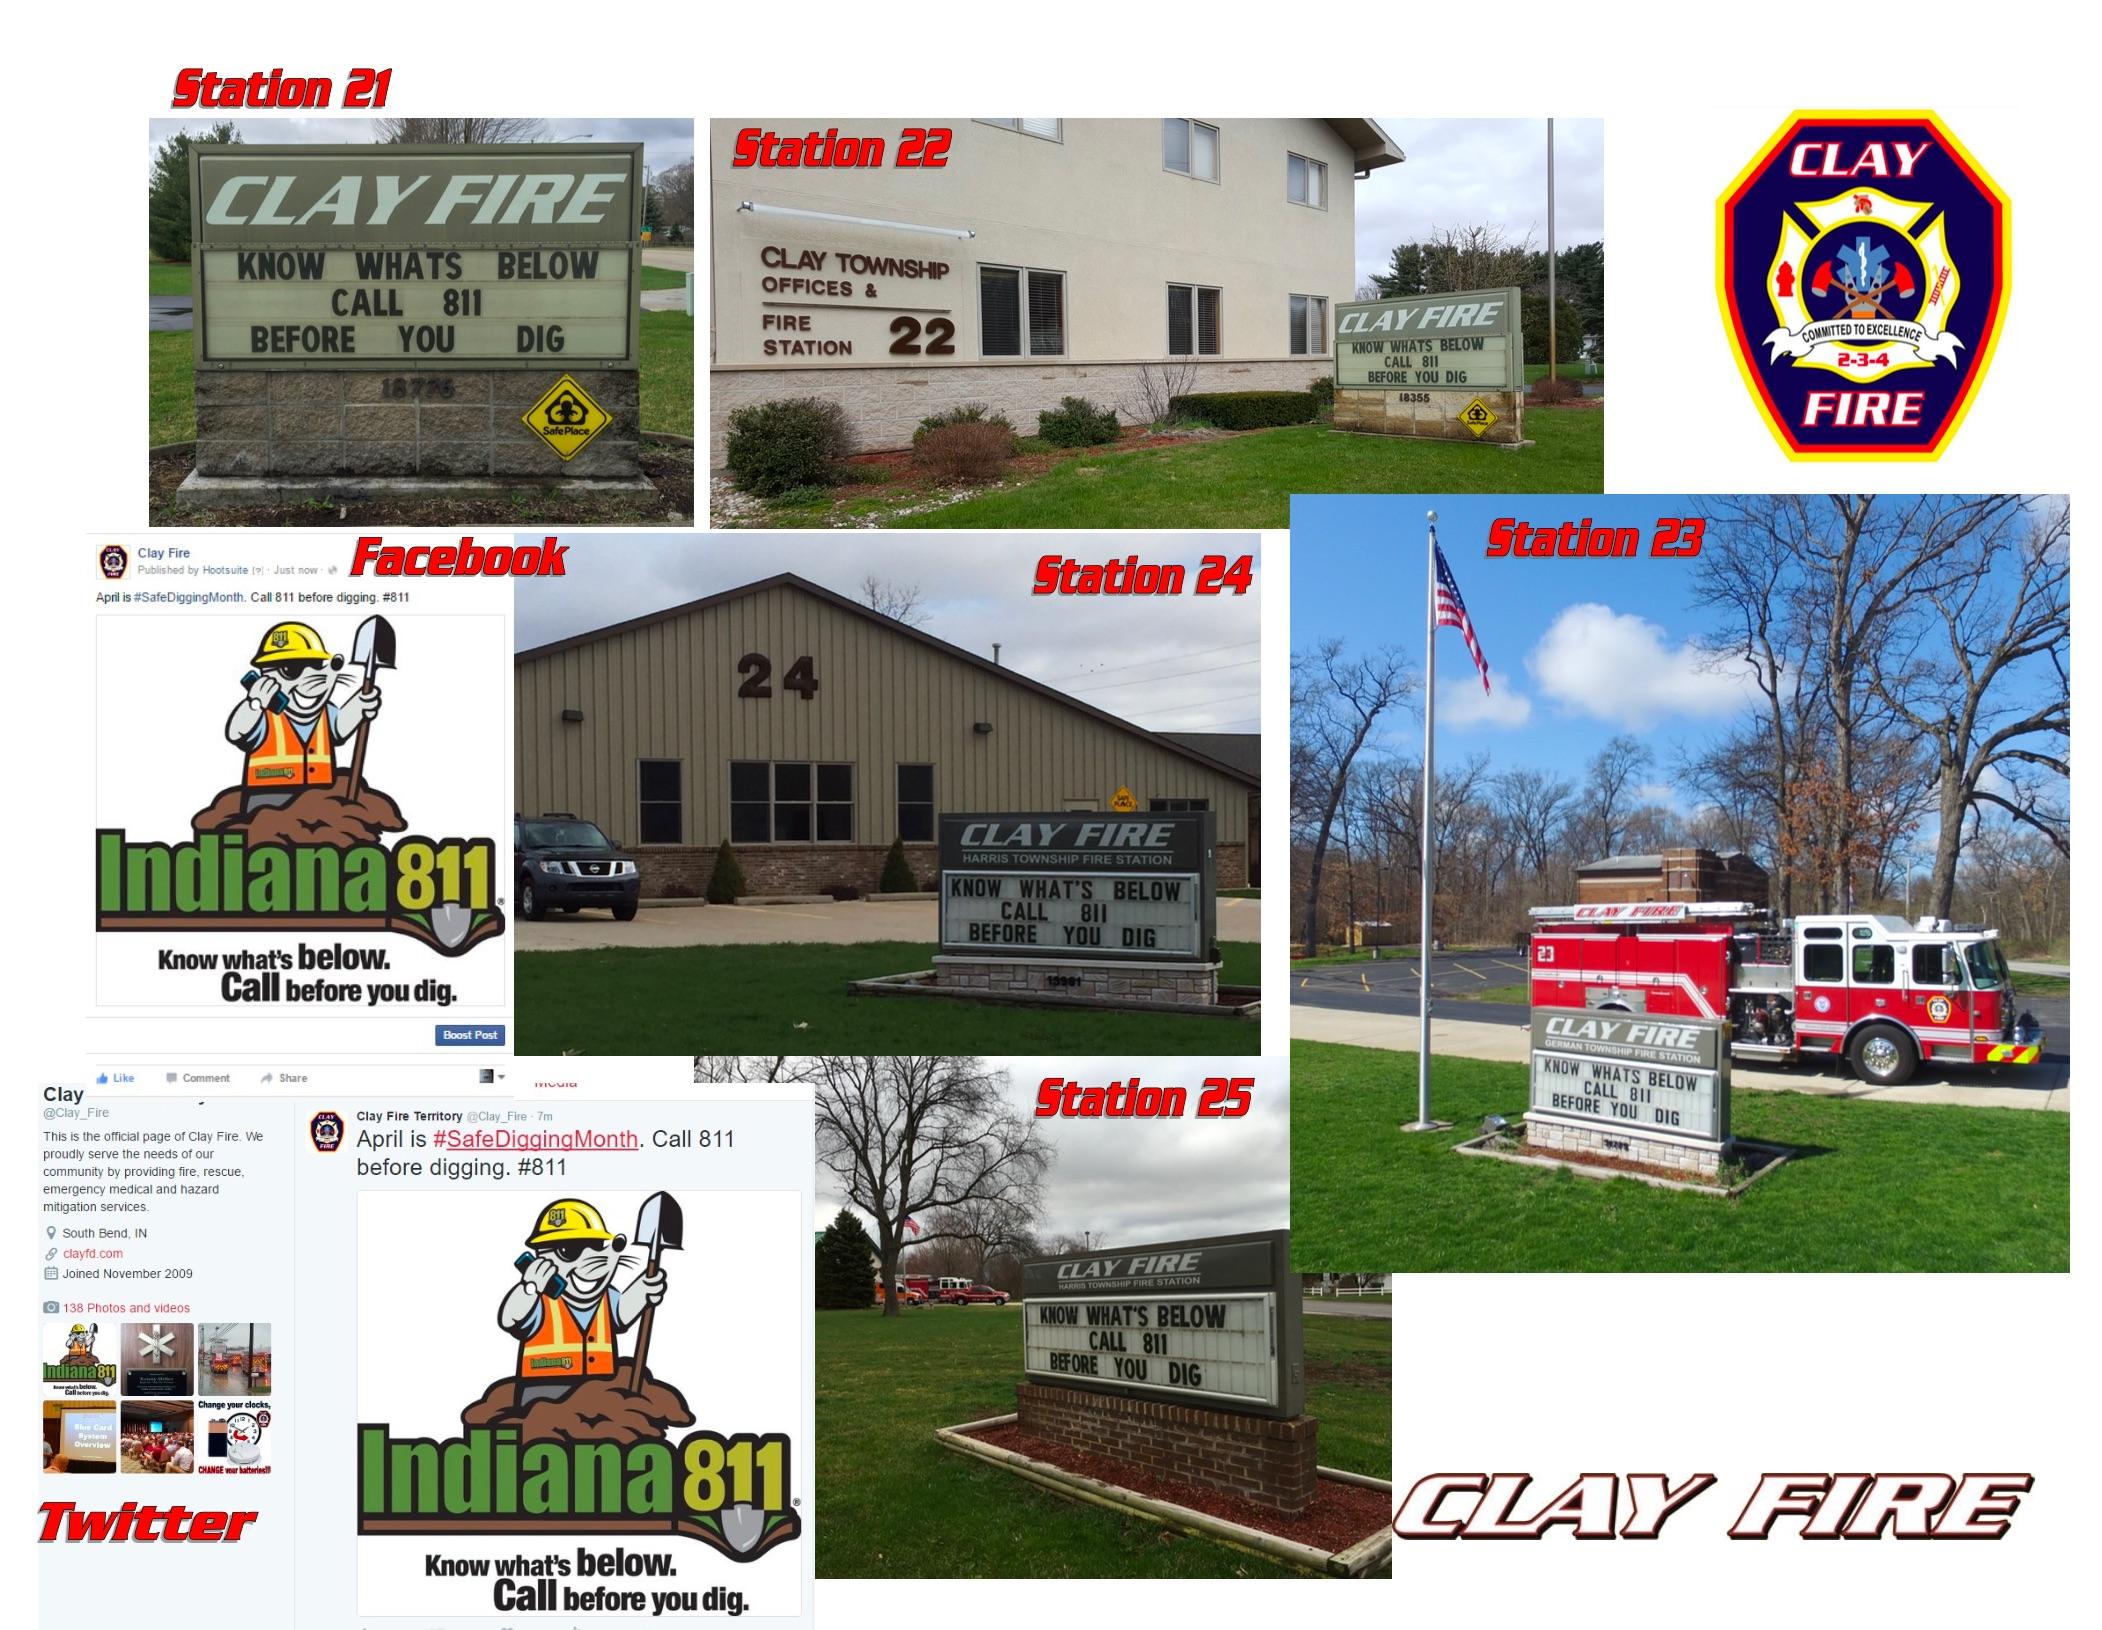 Clay Fire Territory